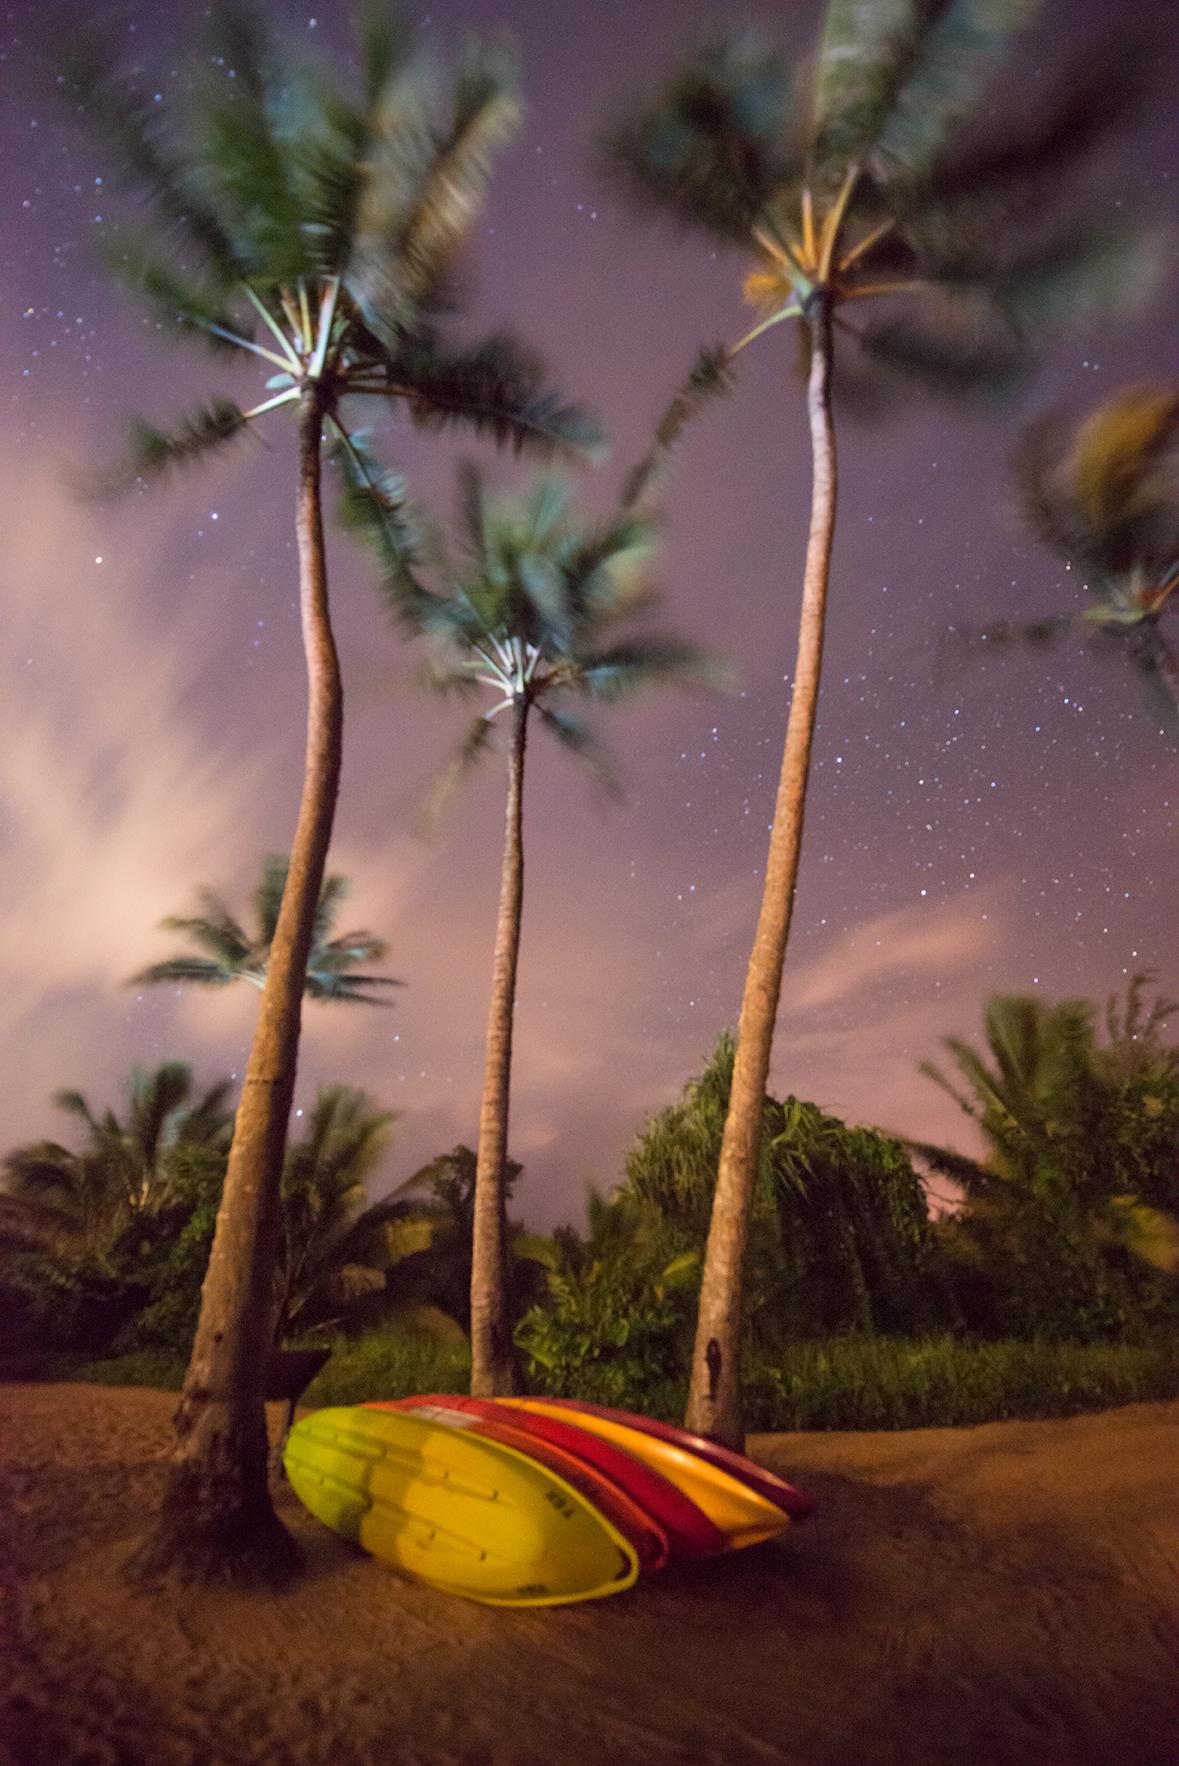 Pu'u Poa Beach, Kauai, Hawaii